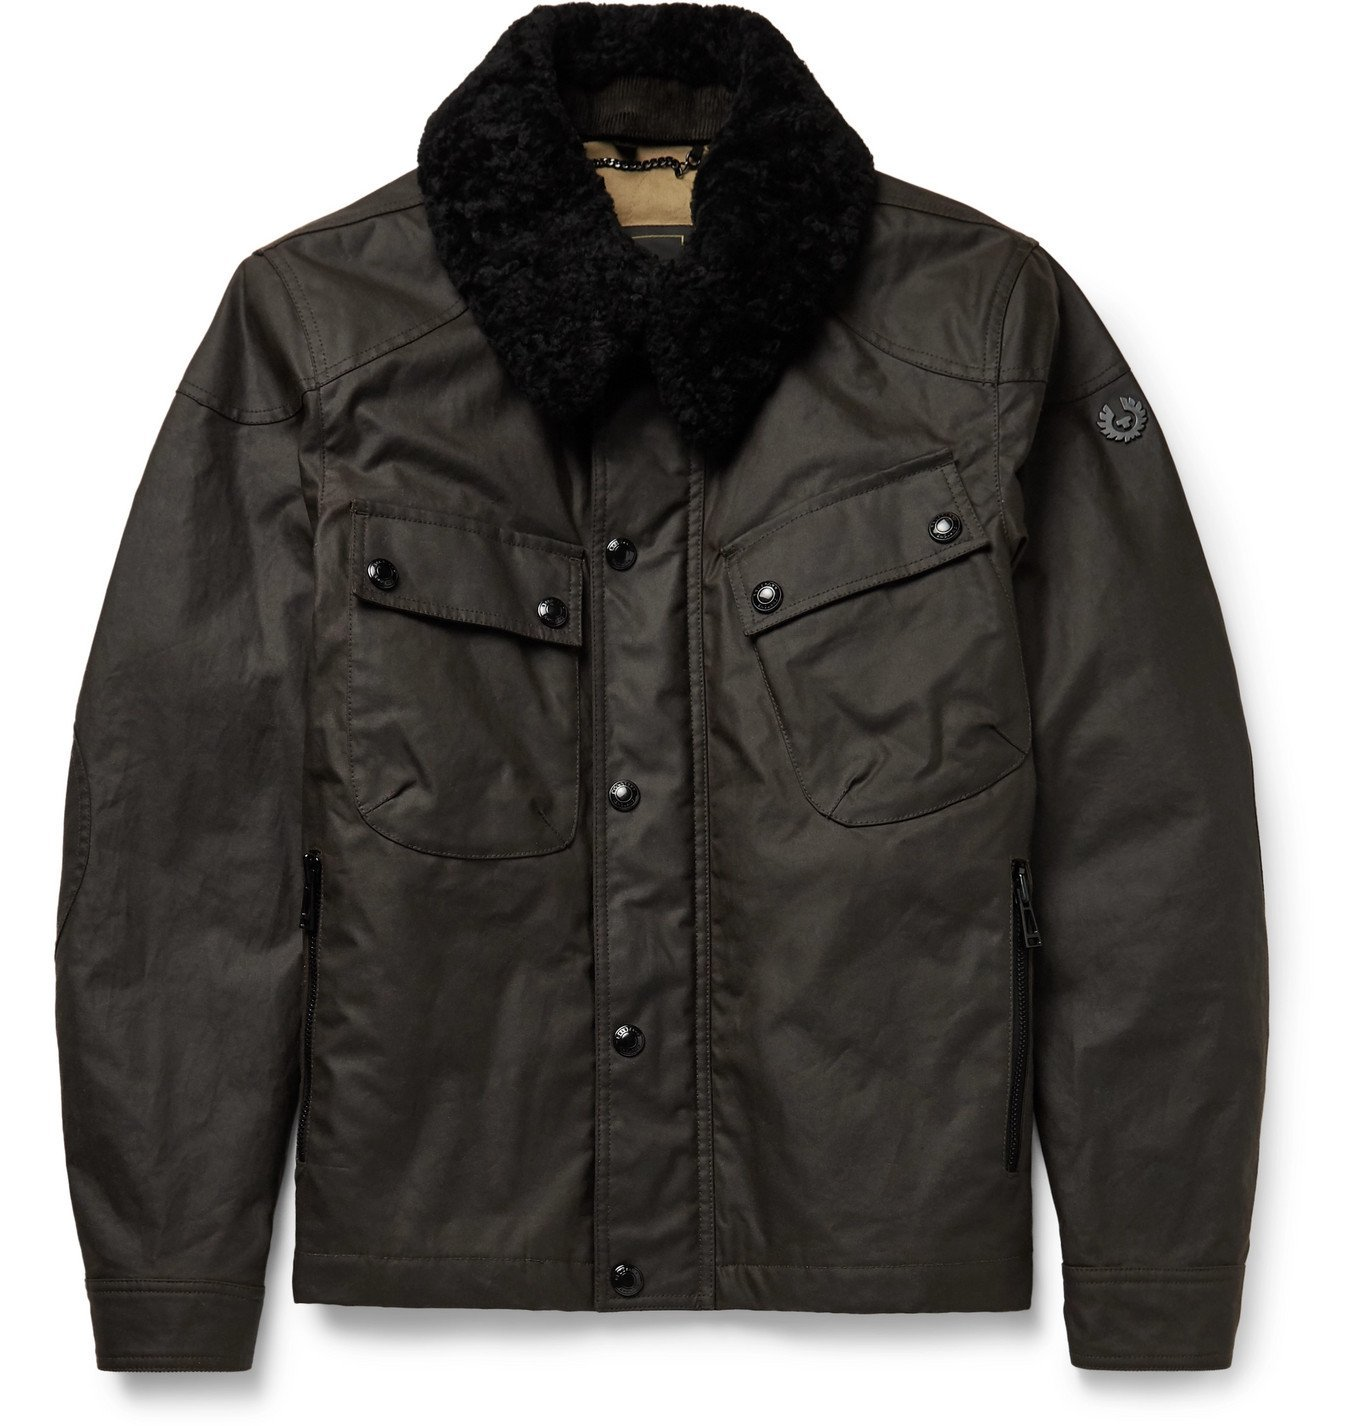 Belstaff - Patrol Shearling-Trimmed Waxed-Cotton Jacket - Brown